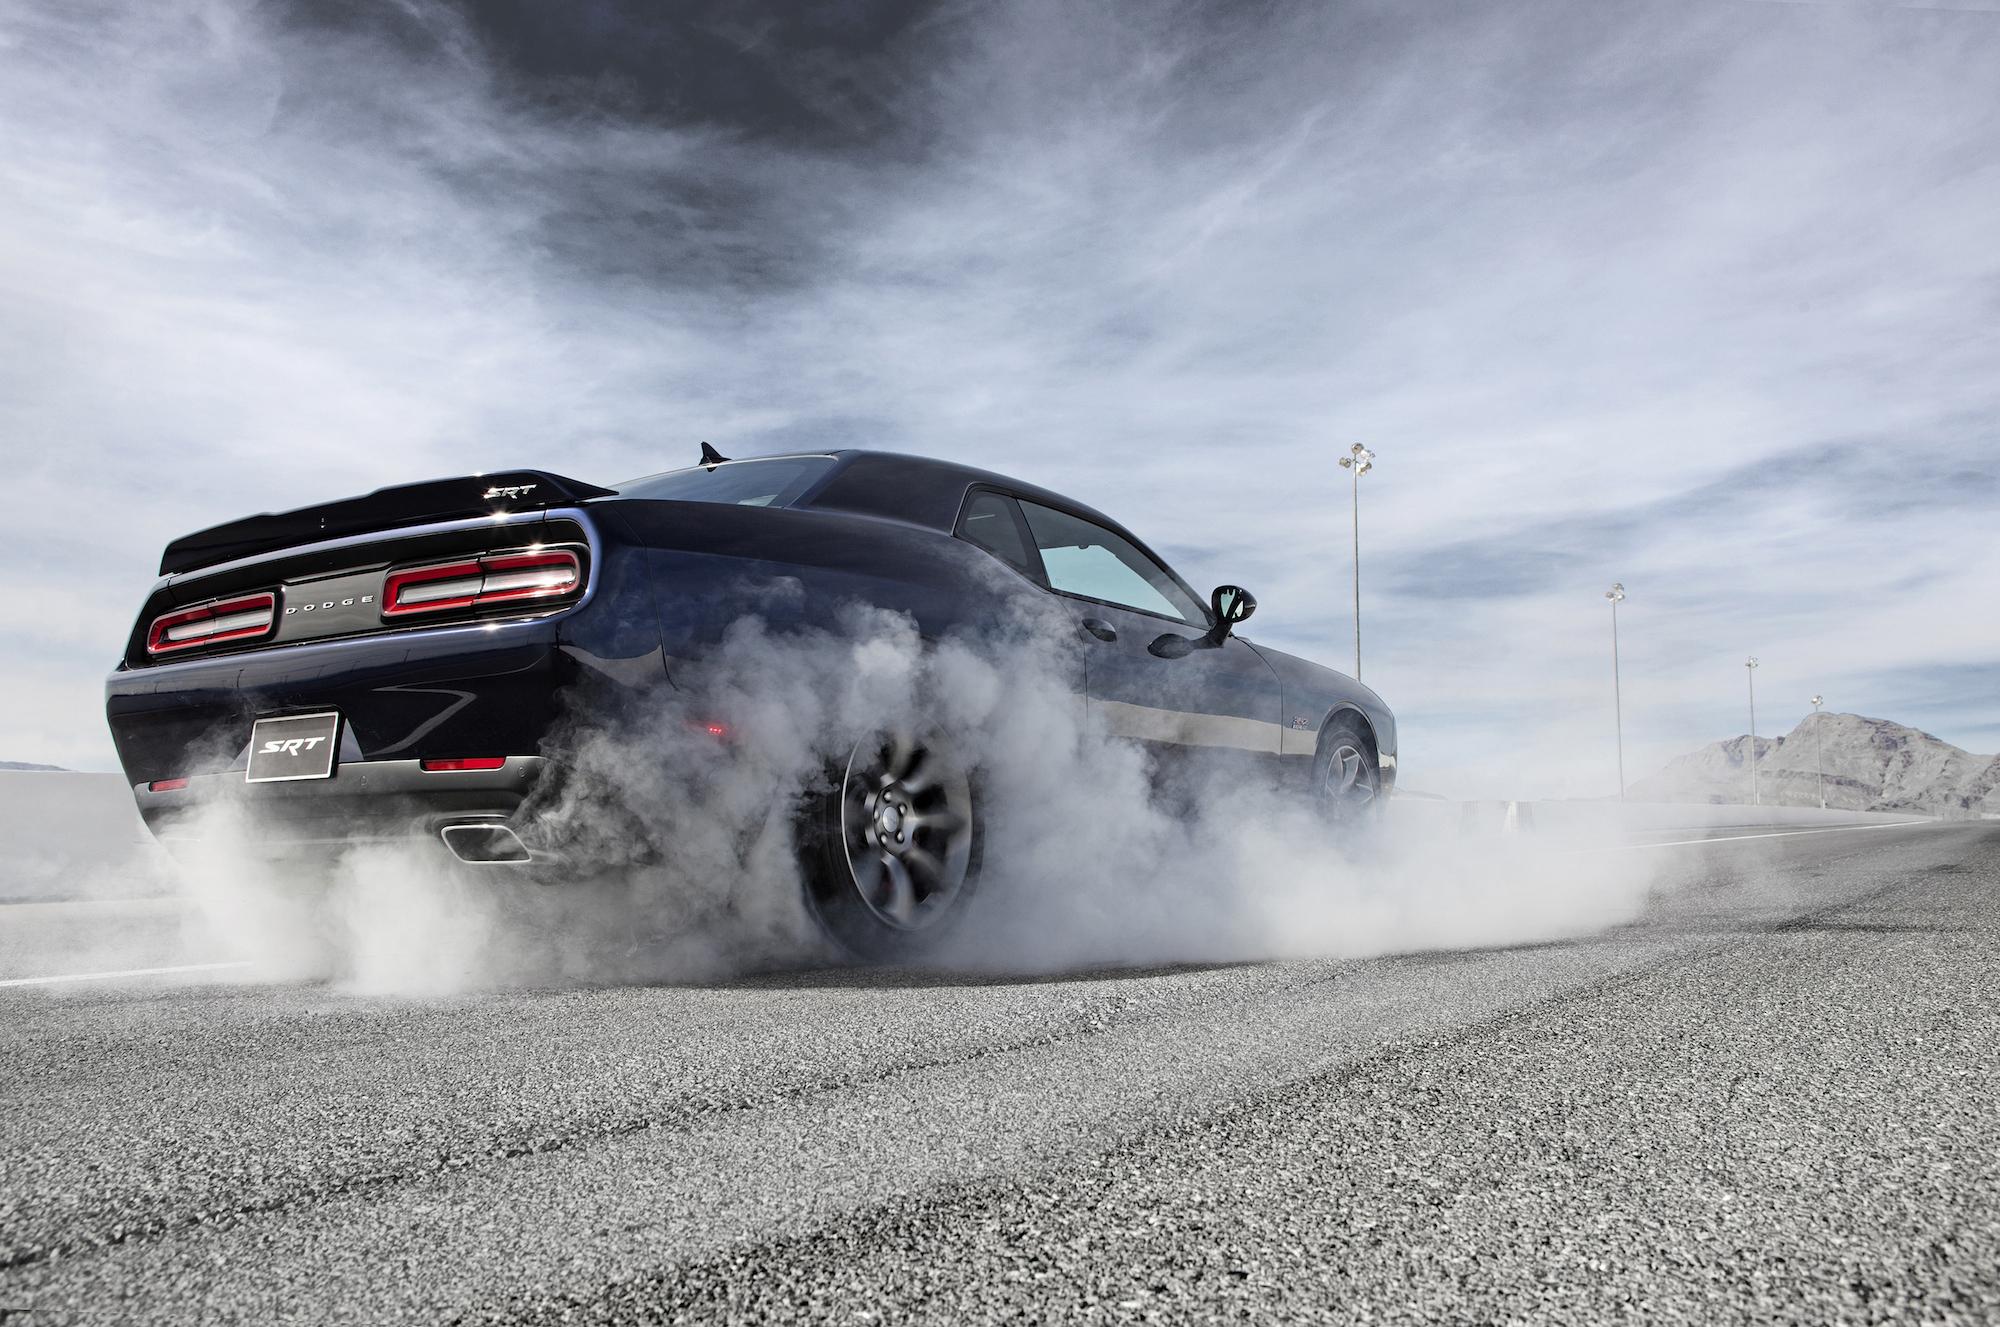 2015 Challenger SRT, 2015 Charger SRT, Ferrari SP America: This Week's Top Photos